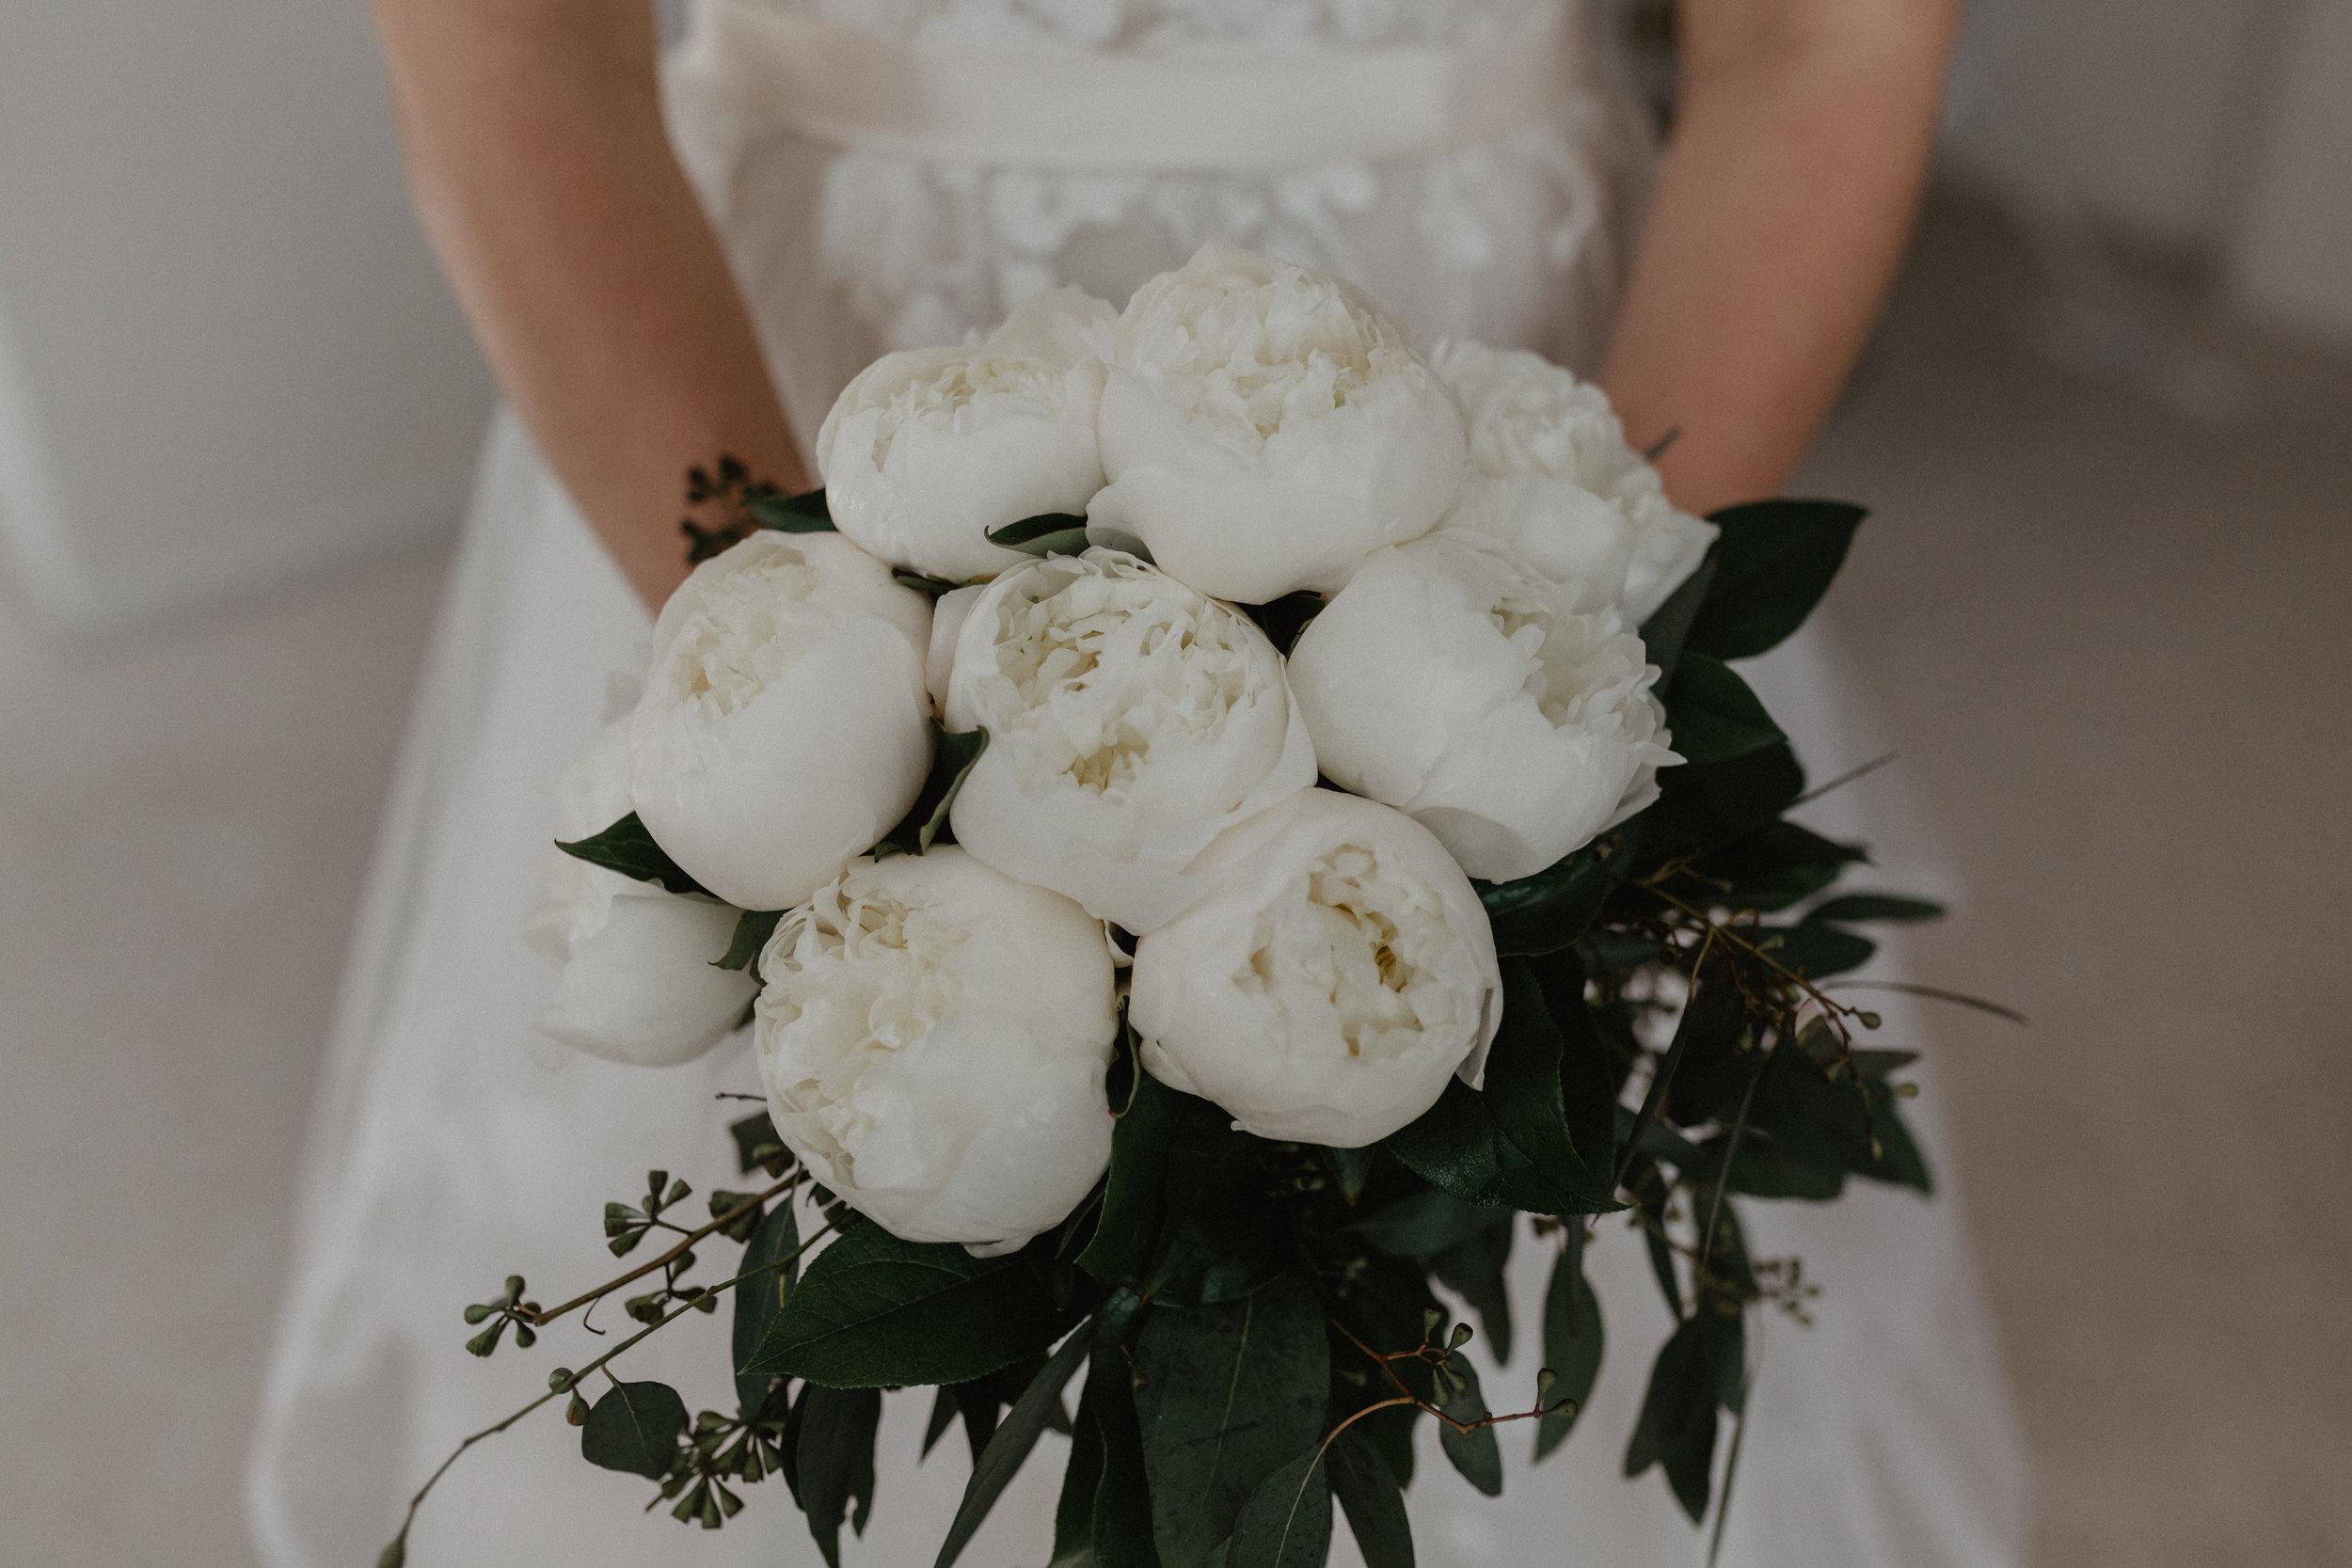 upstate_ny_wedding-19.jpg